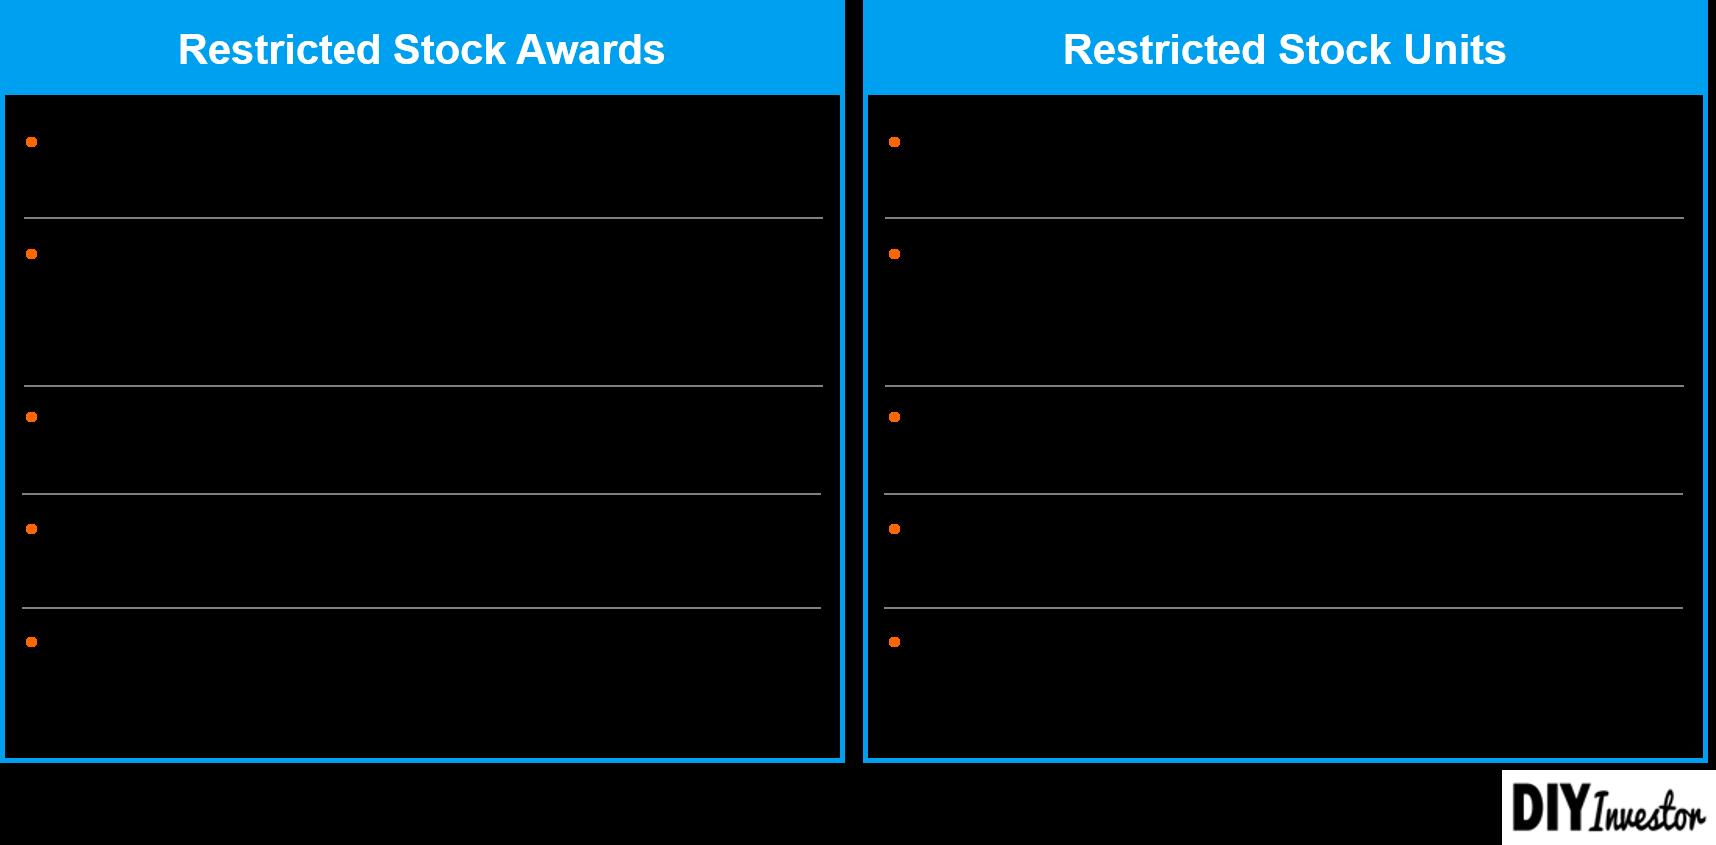 Aktienbasierte Vergütung - Restricted Stock Awards versus Restricted Stock Units